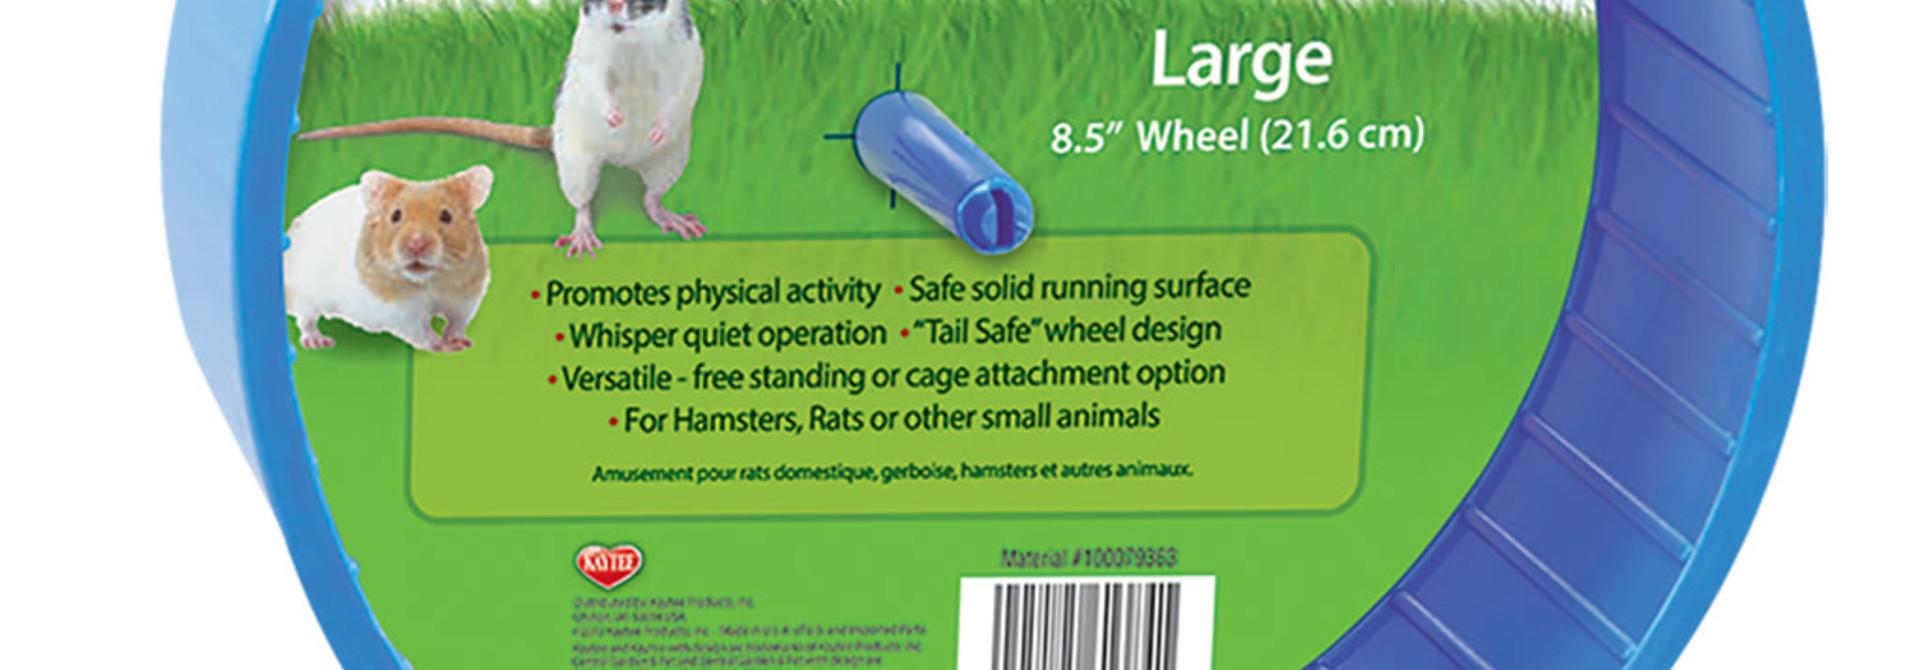 Comfort Wheel Large 8.5